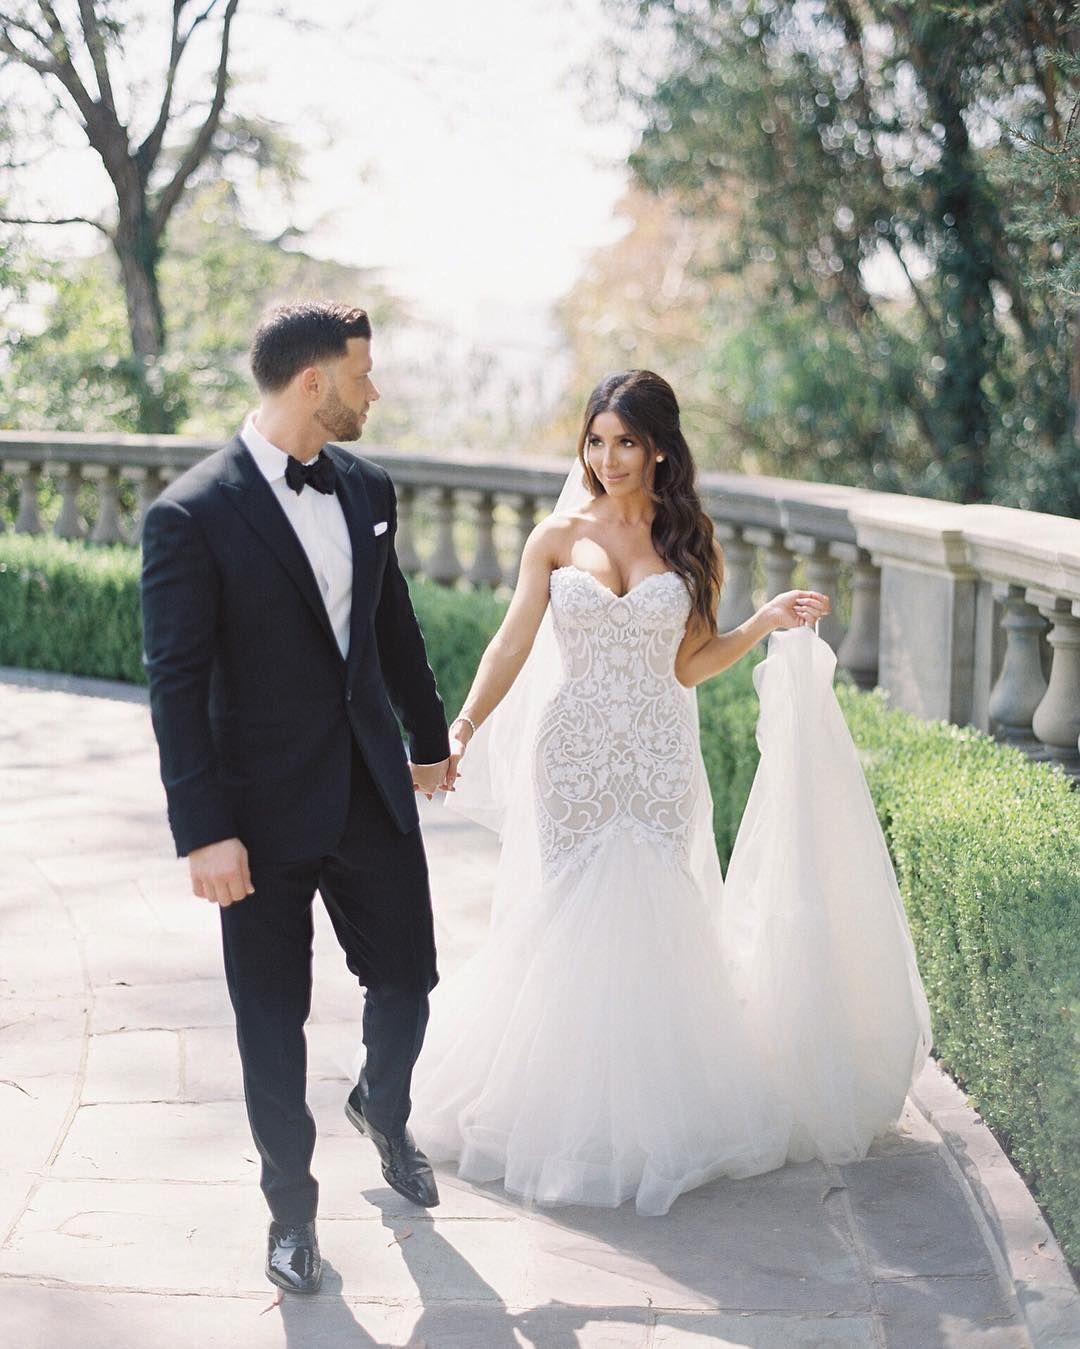 Melissa Molinaro Wedding Wedding Hairstyles Bride Wedding